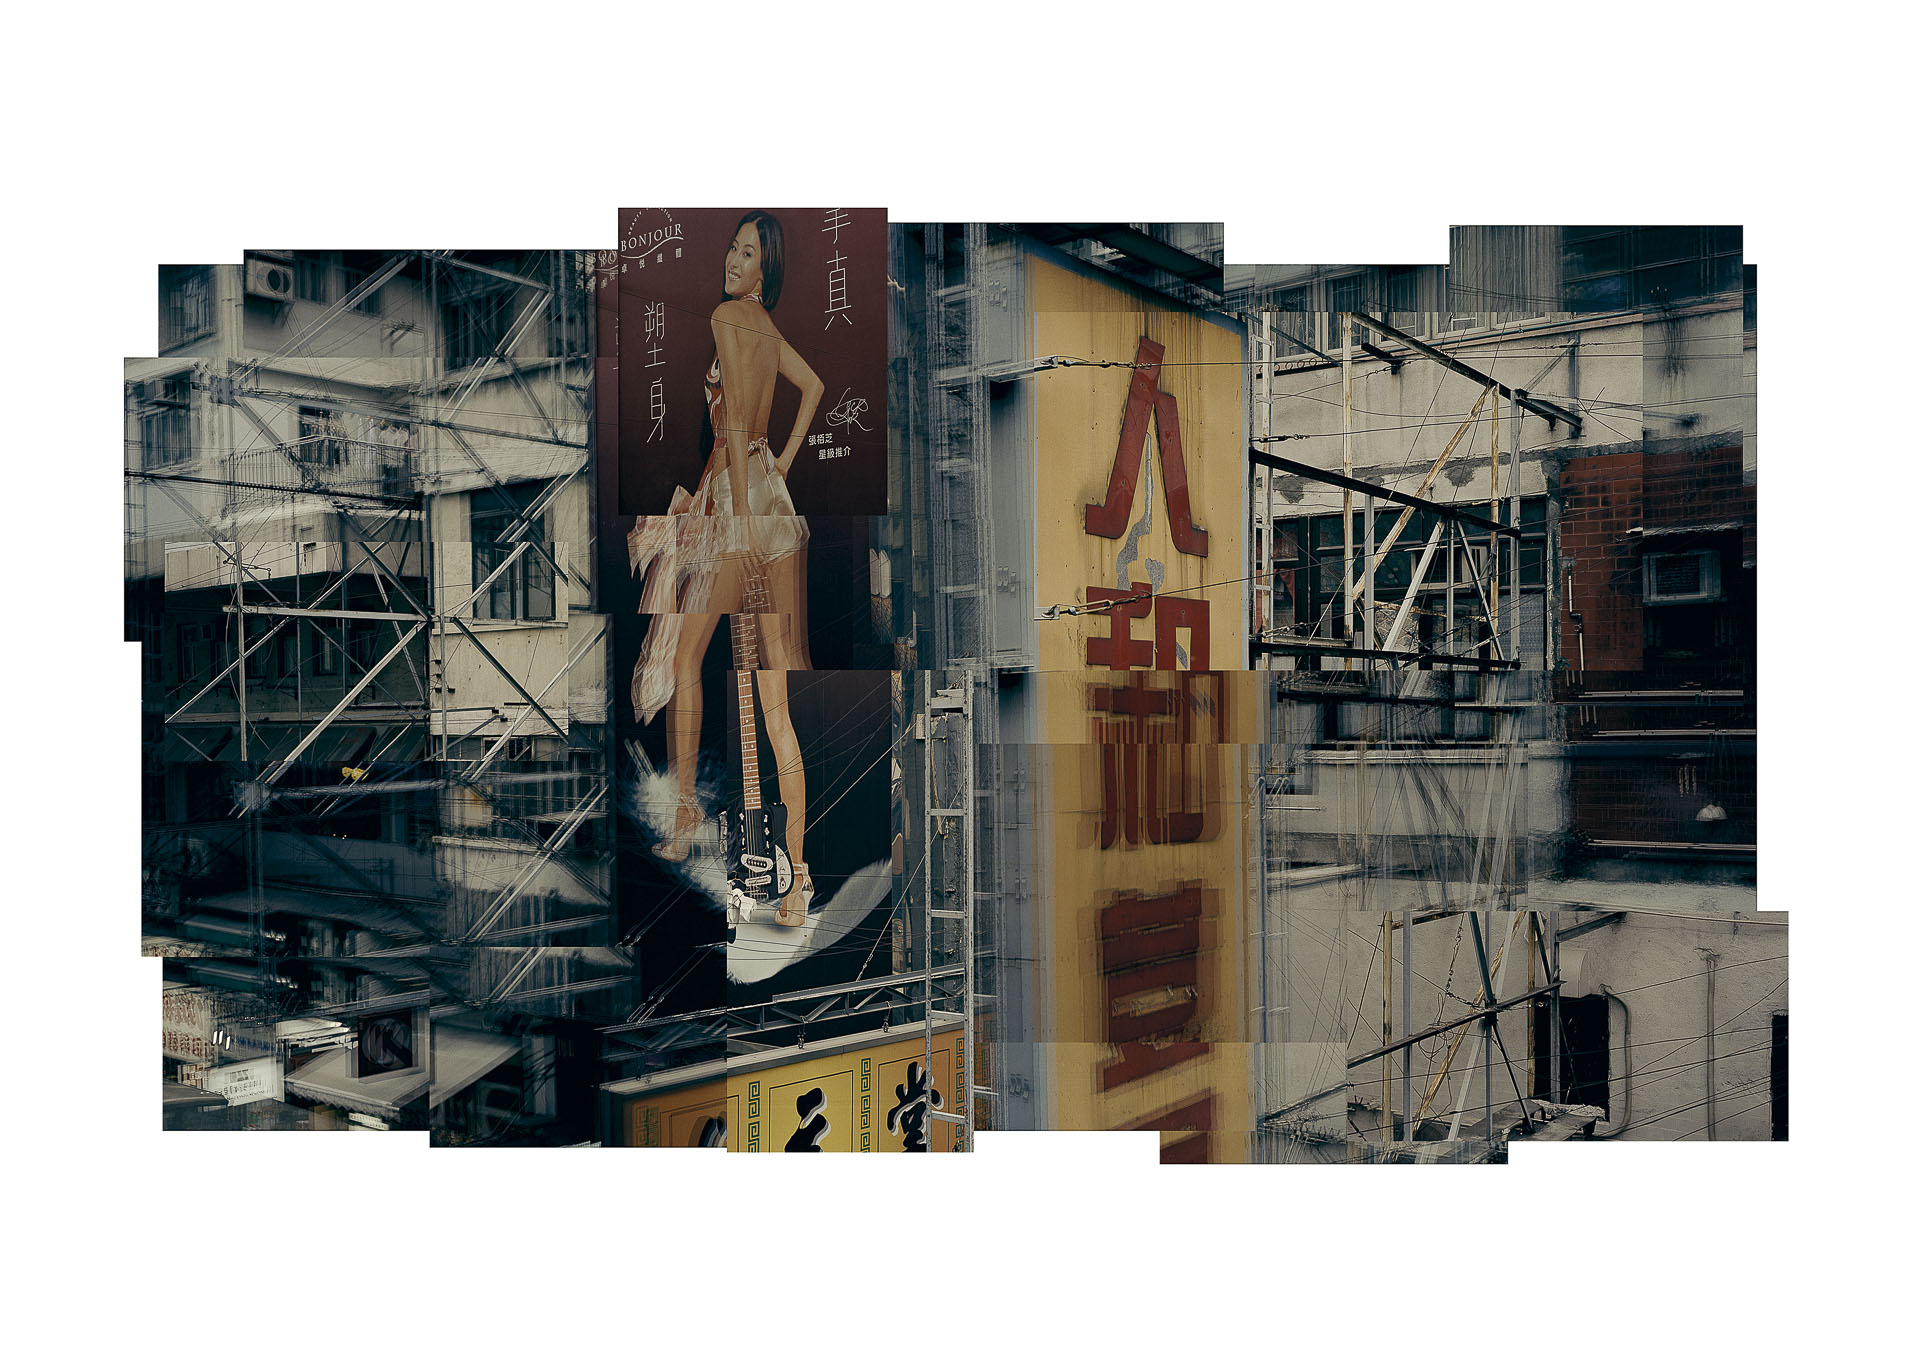 Hong kong per libro 7